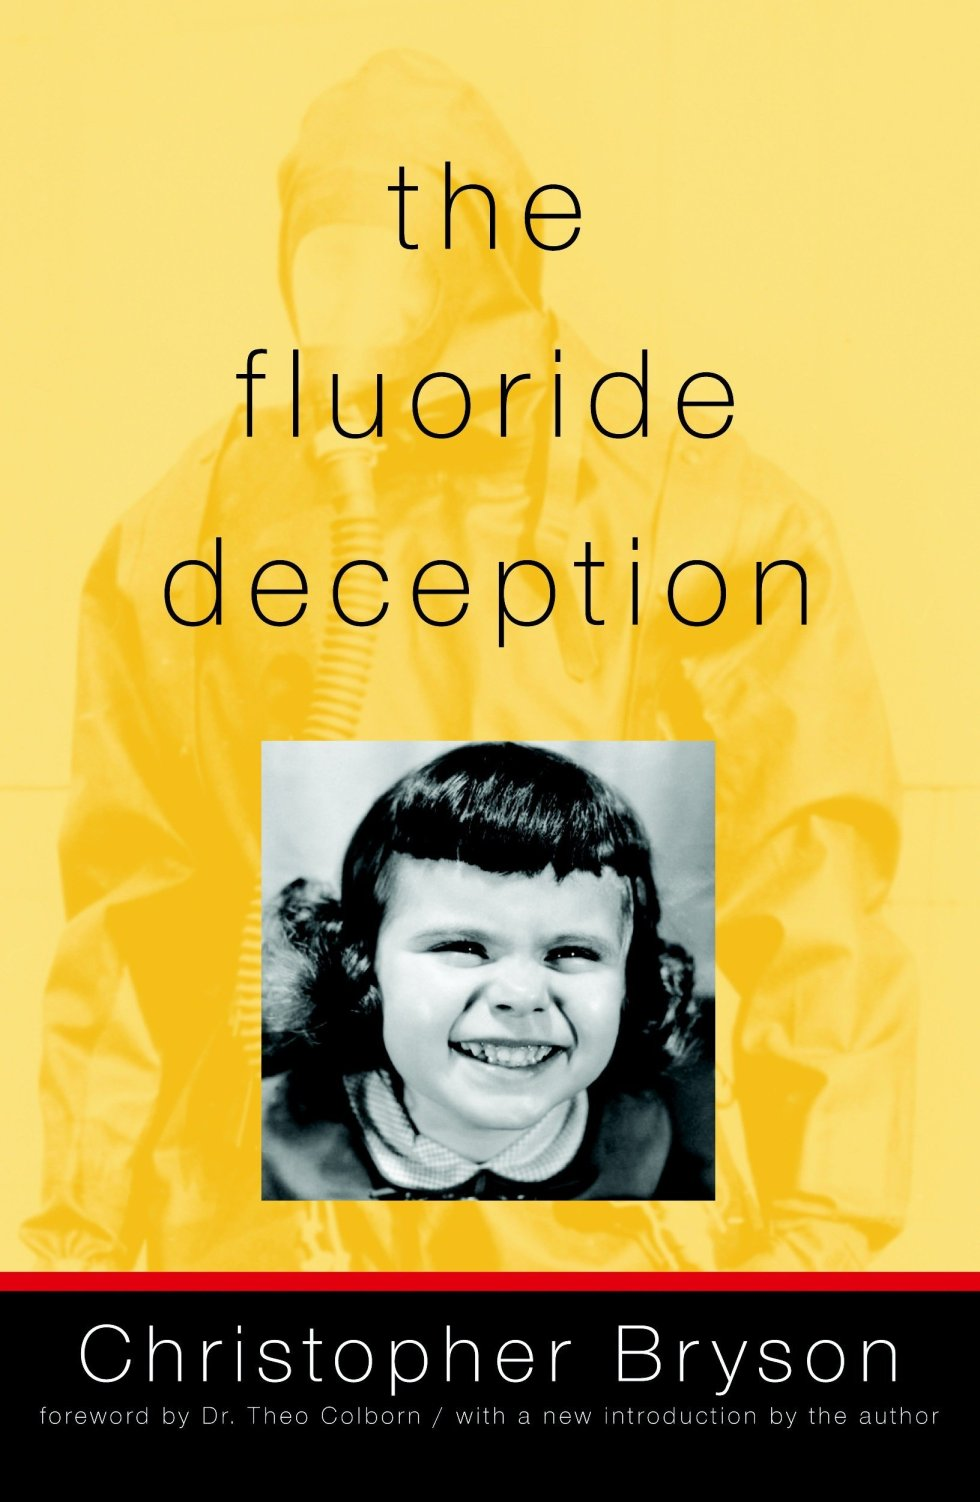 the flouride deception